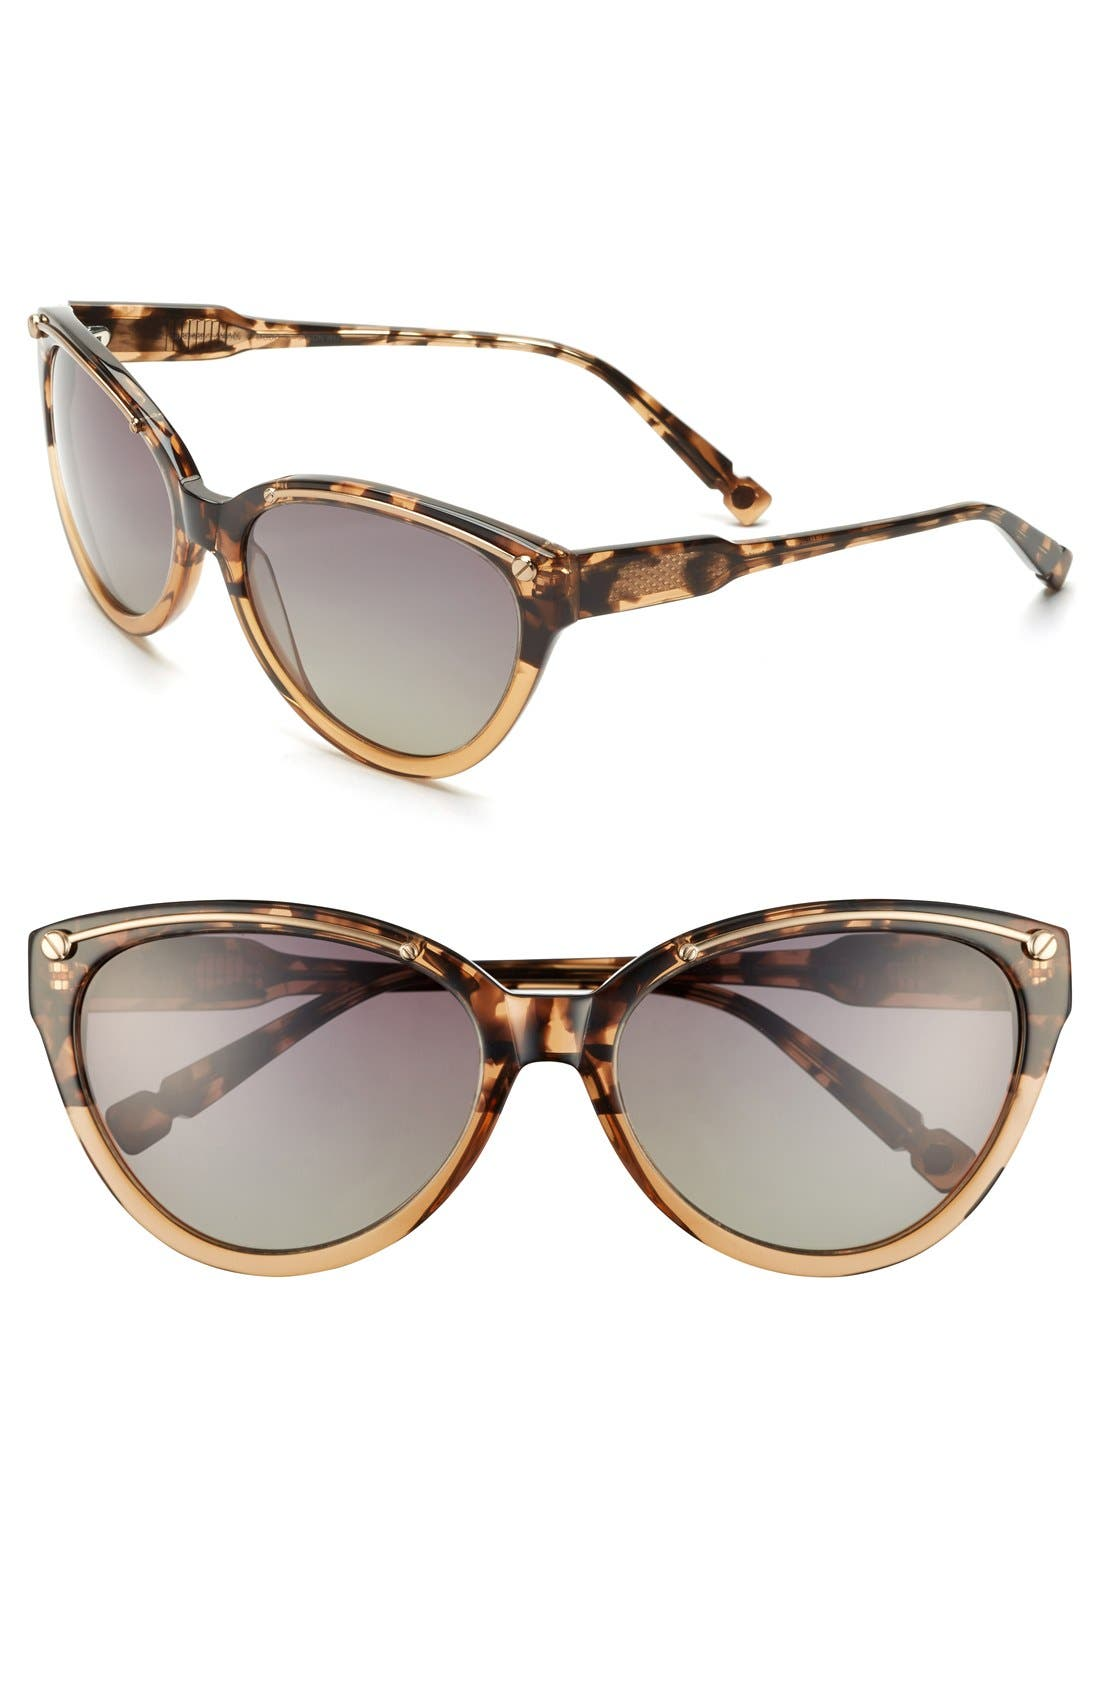 Main Image - Jason Wu 'Anais' 58mm Sunglasses